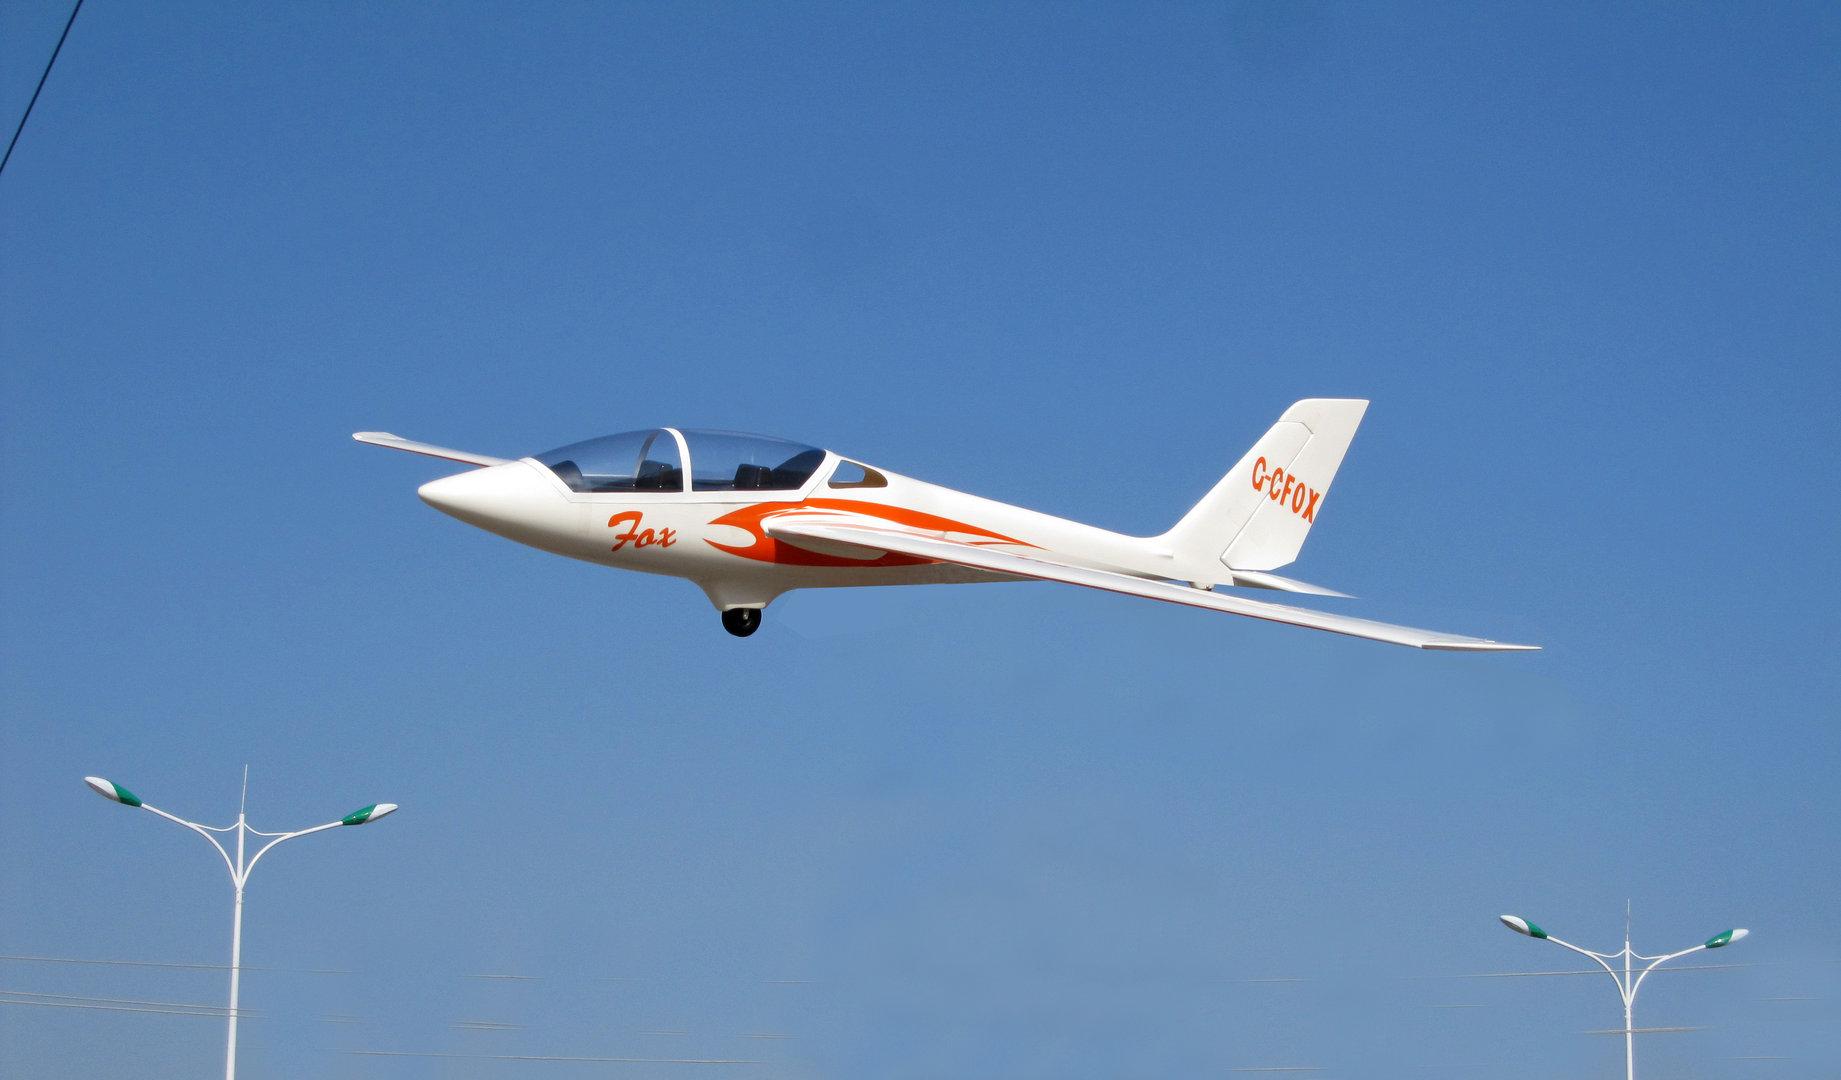 Gens ace 2200mAh 3S 30C Lipo battery-Fox Glider